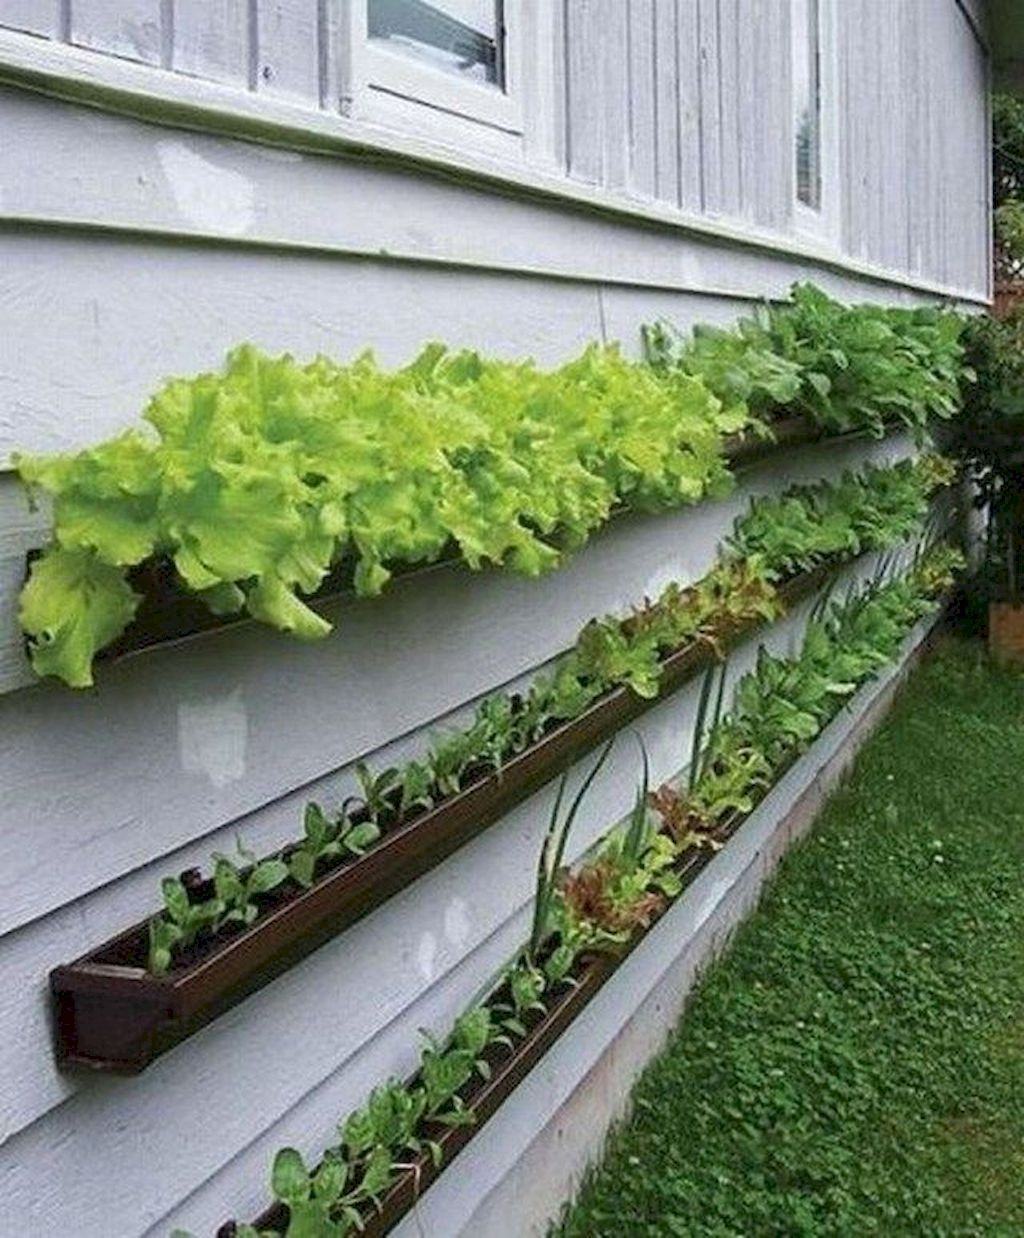 Rustic Vegetable Garden Design Ideas For Your Backyard Inspiration 26